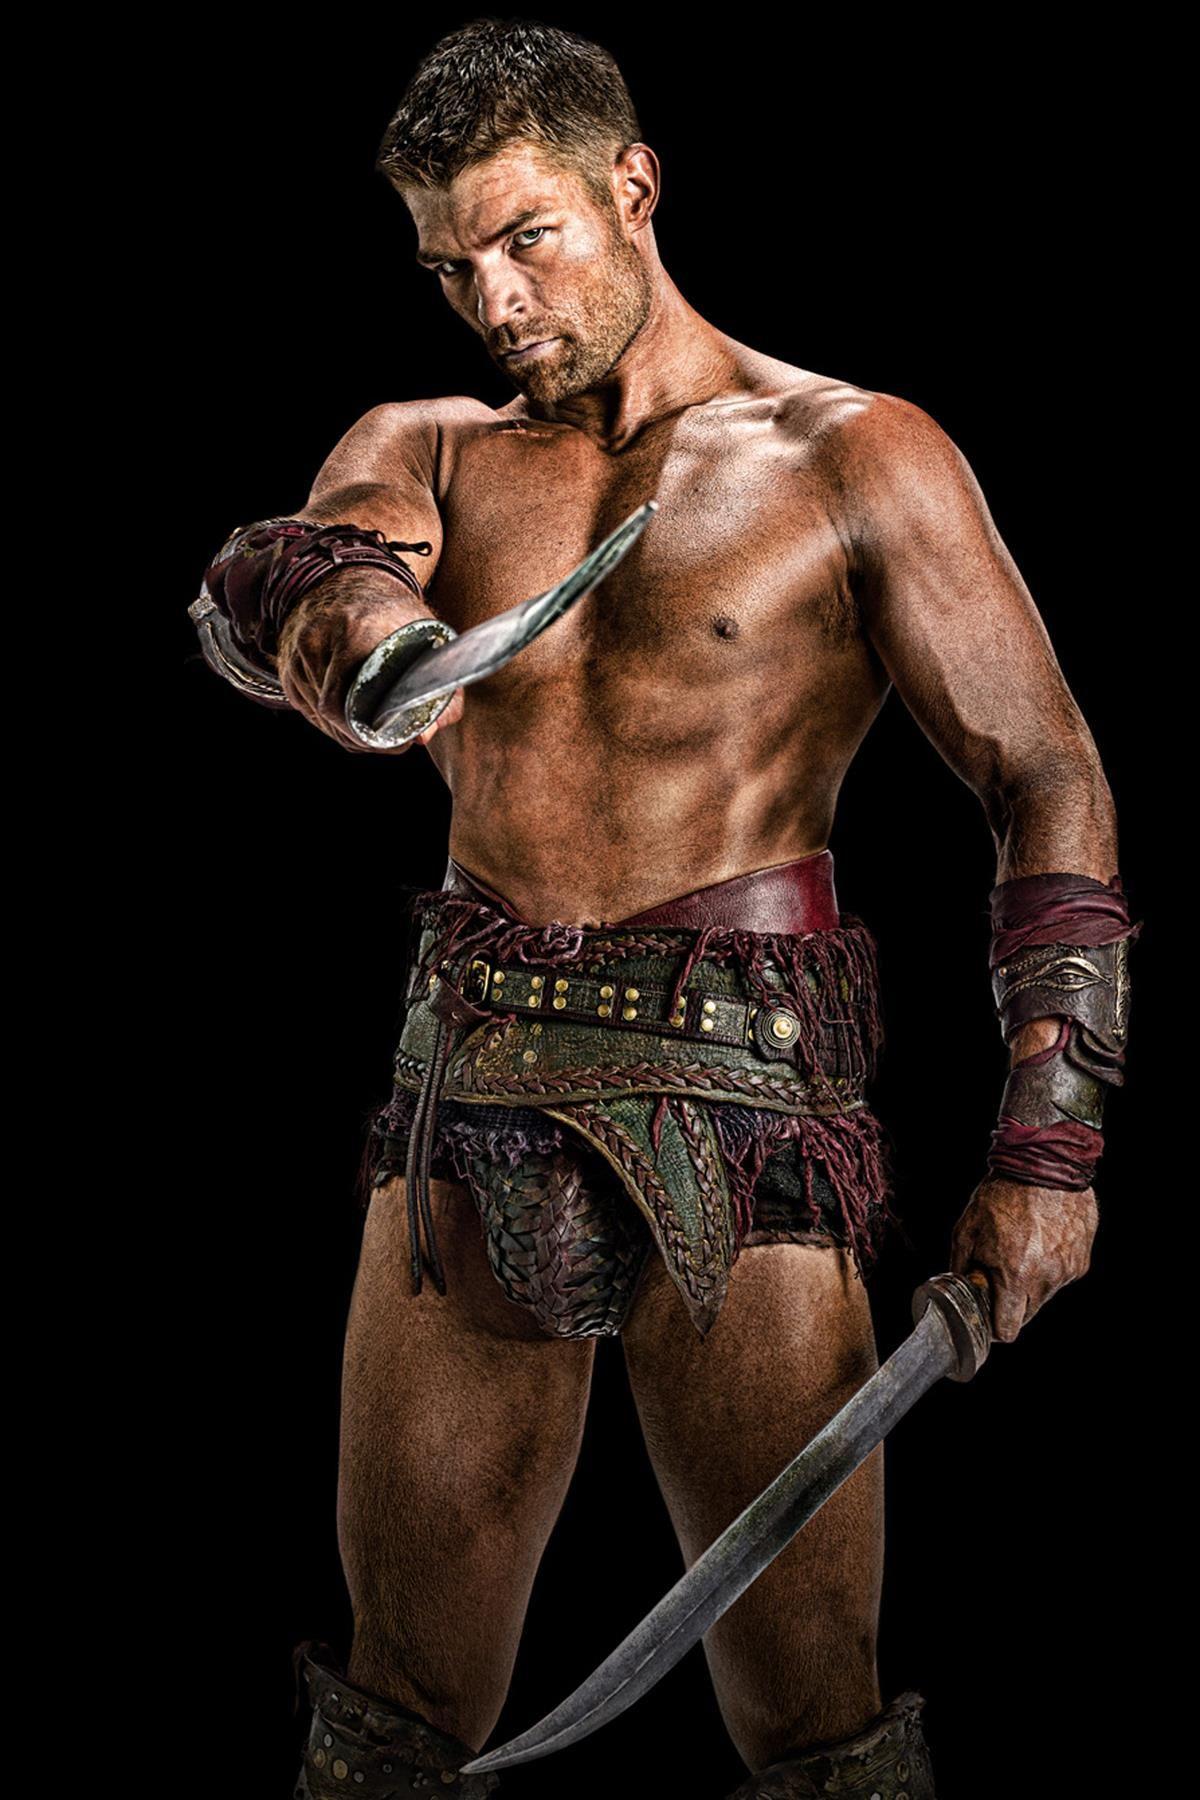 Gladiator Streaming Vf Streamcomplet : gladiator, streaming, streamcomplet, Spartacus, Mcintyre,, Series,, Vengeance